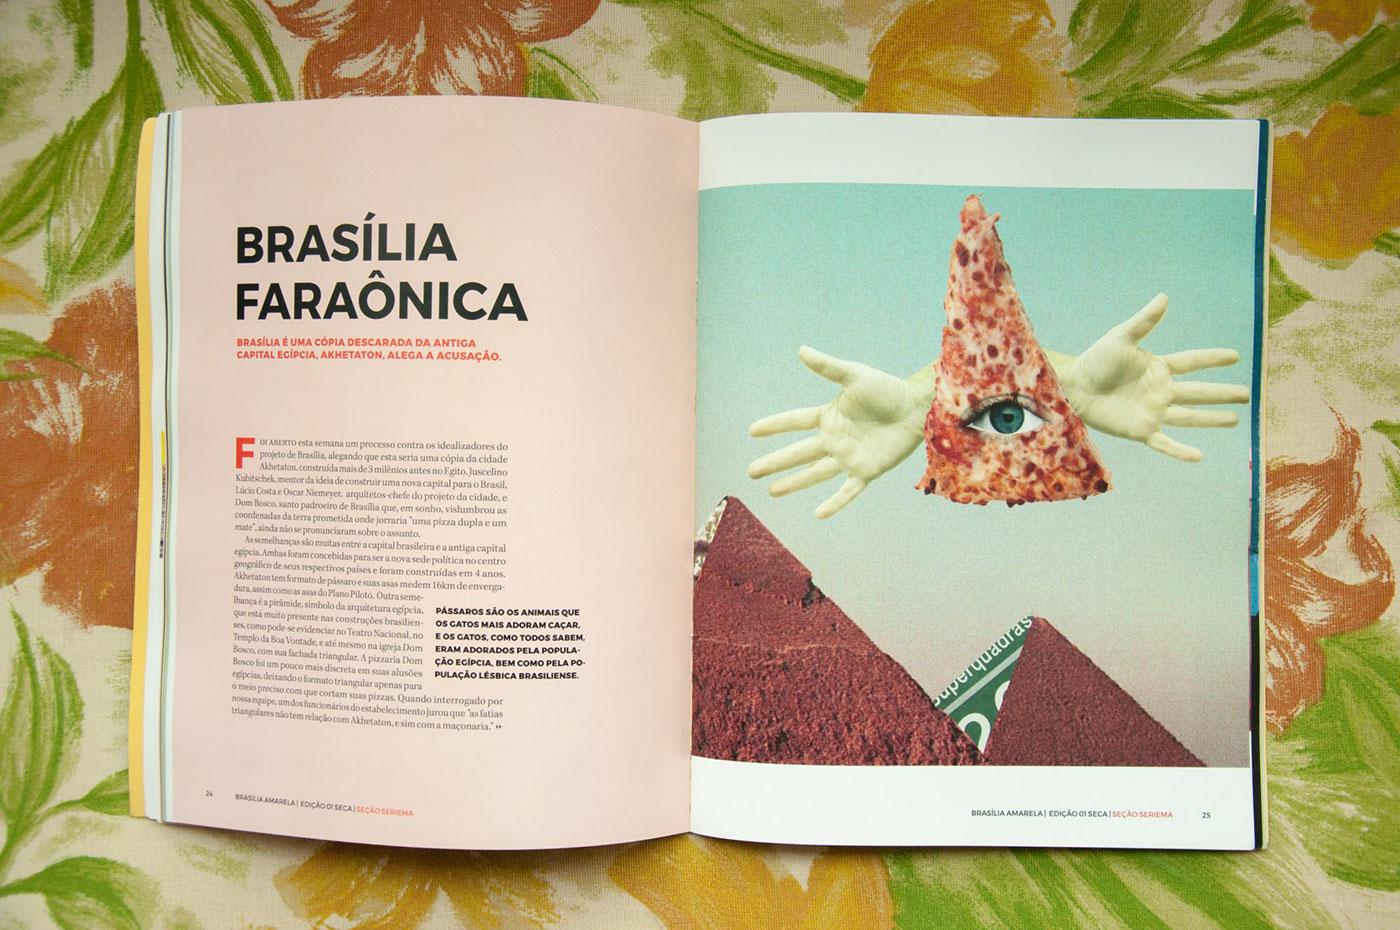 brasilia amarela yellow magazine traditional ink collage fiction fantasy city print